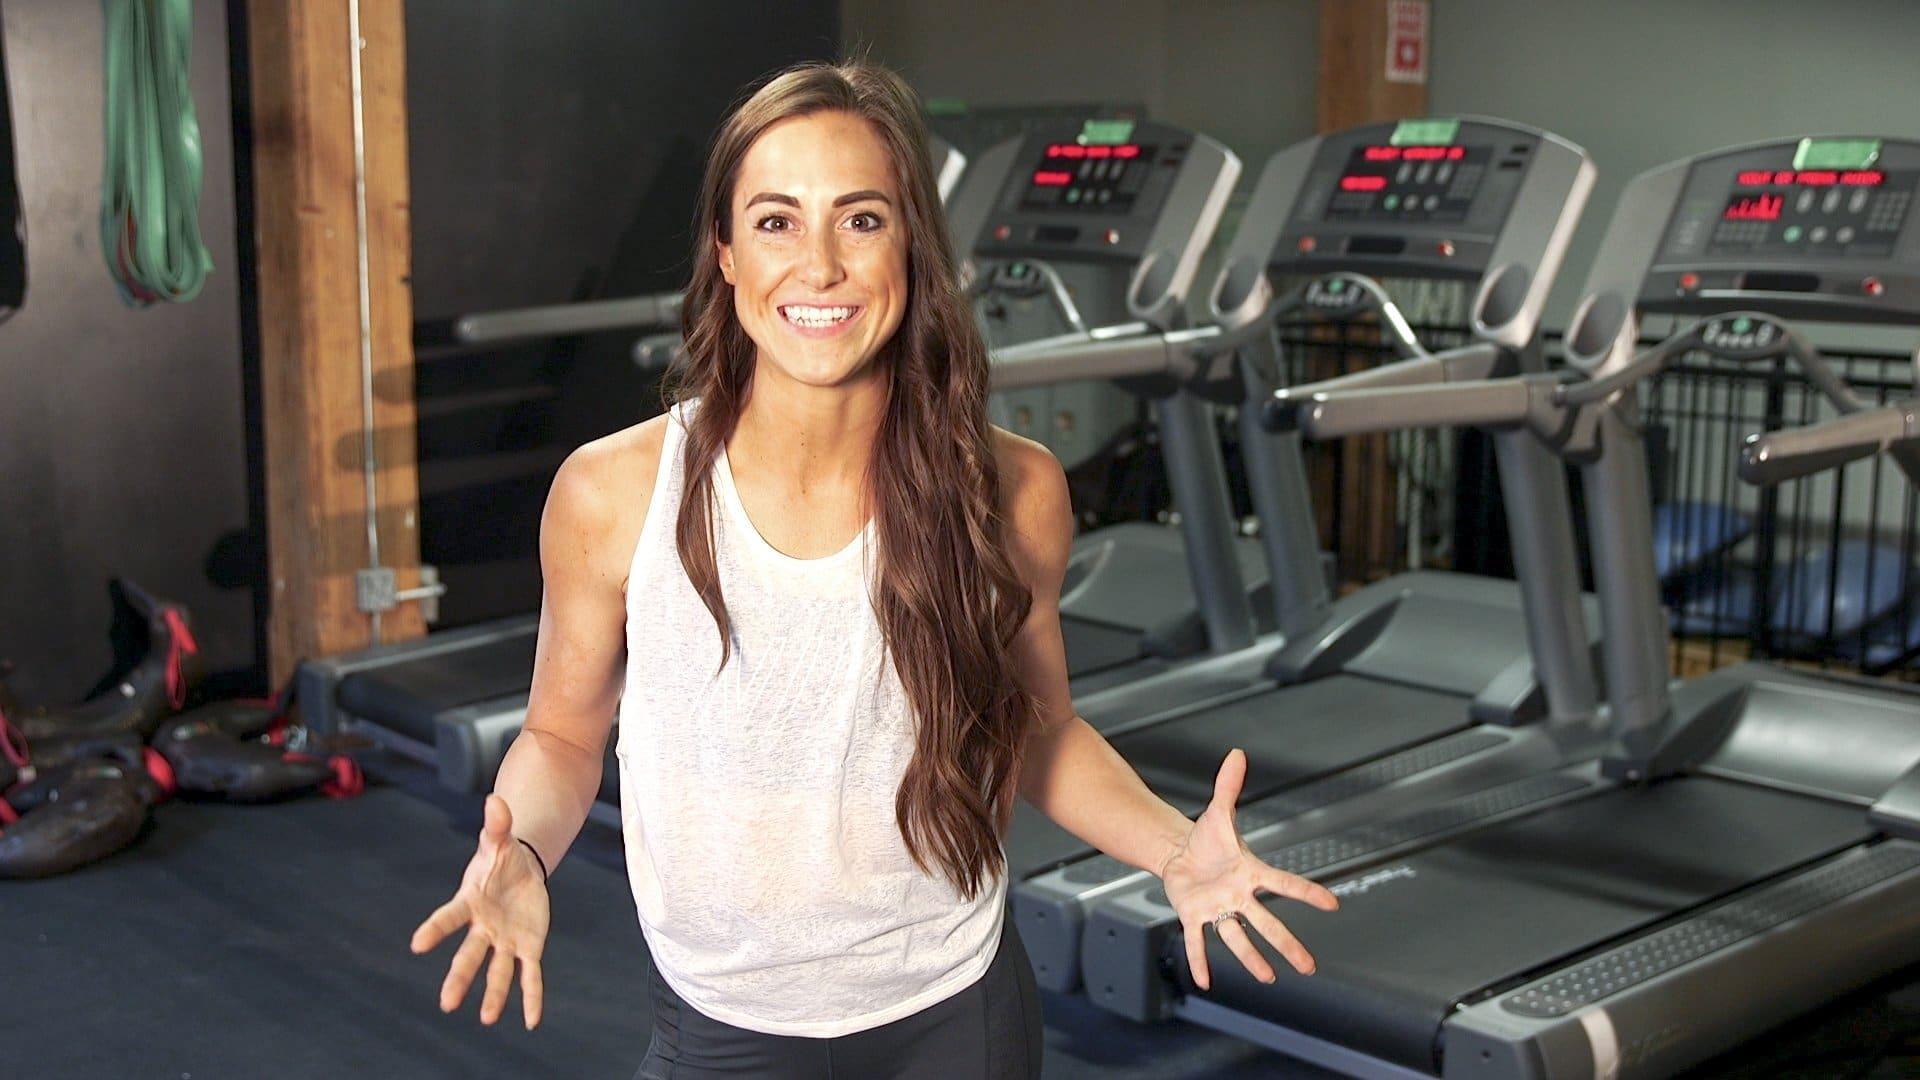 Nikki Metzger Treadmill Workout Feature Image